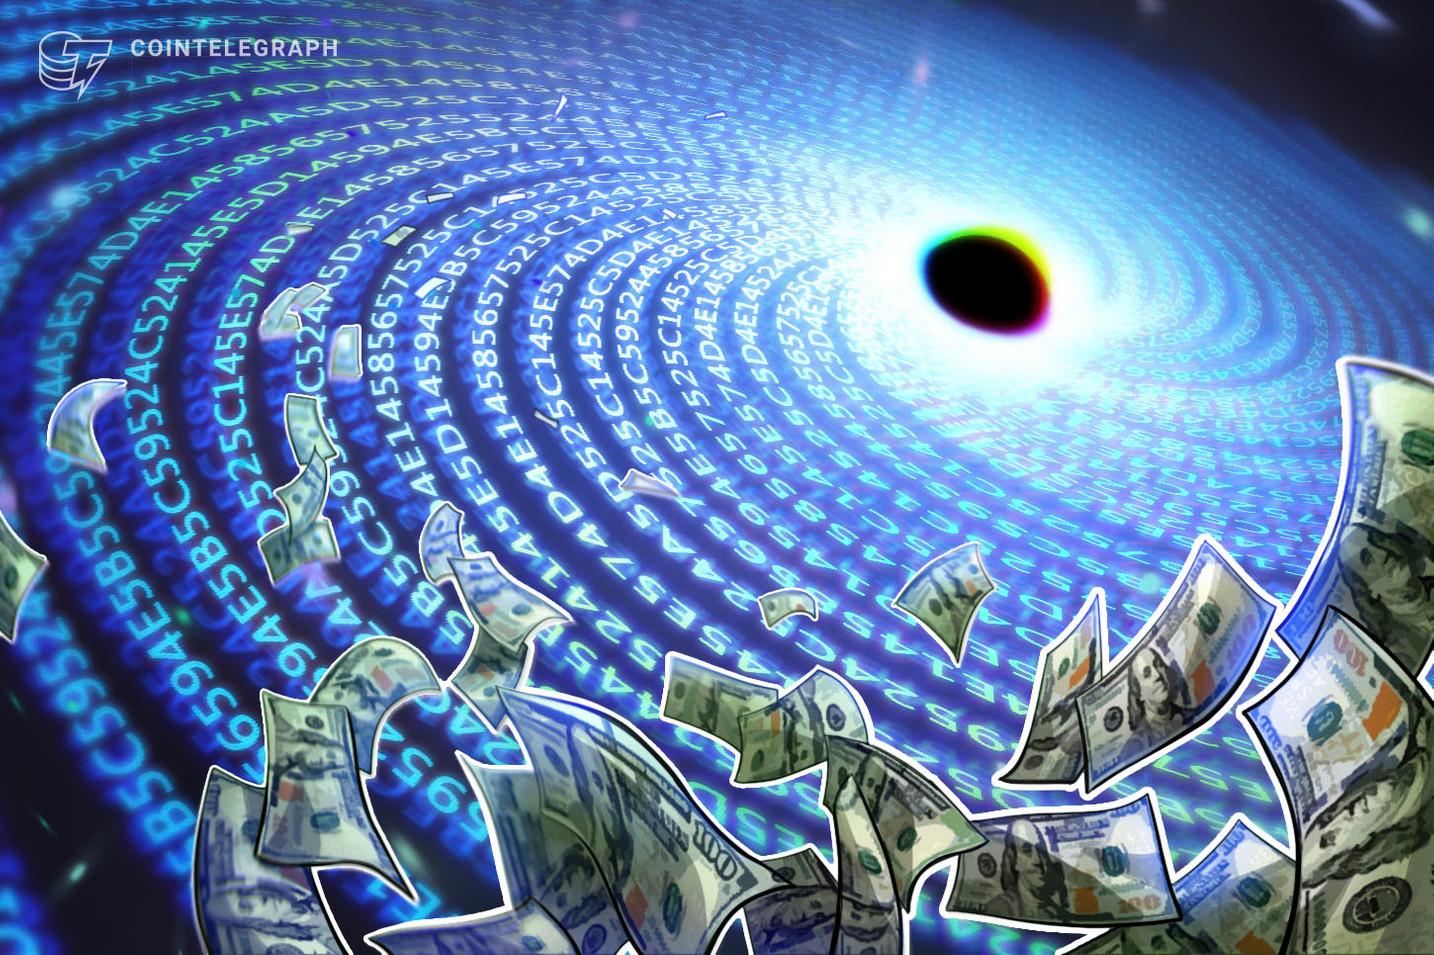 Cream Finance DeFi platform loses $19M in a flash loan hack